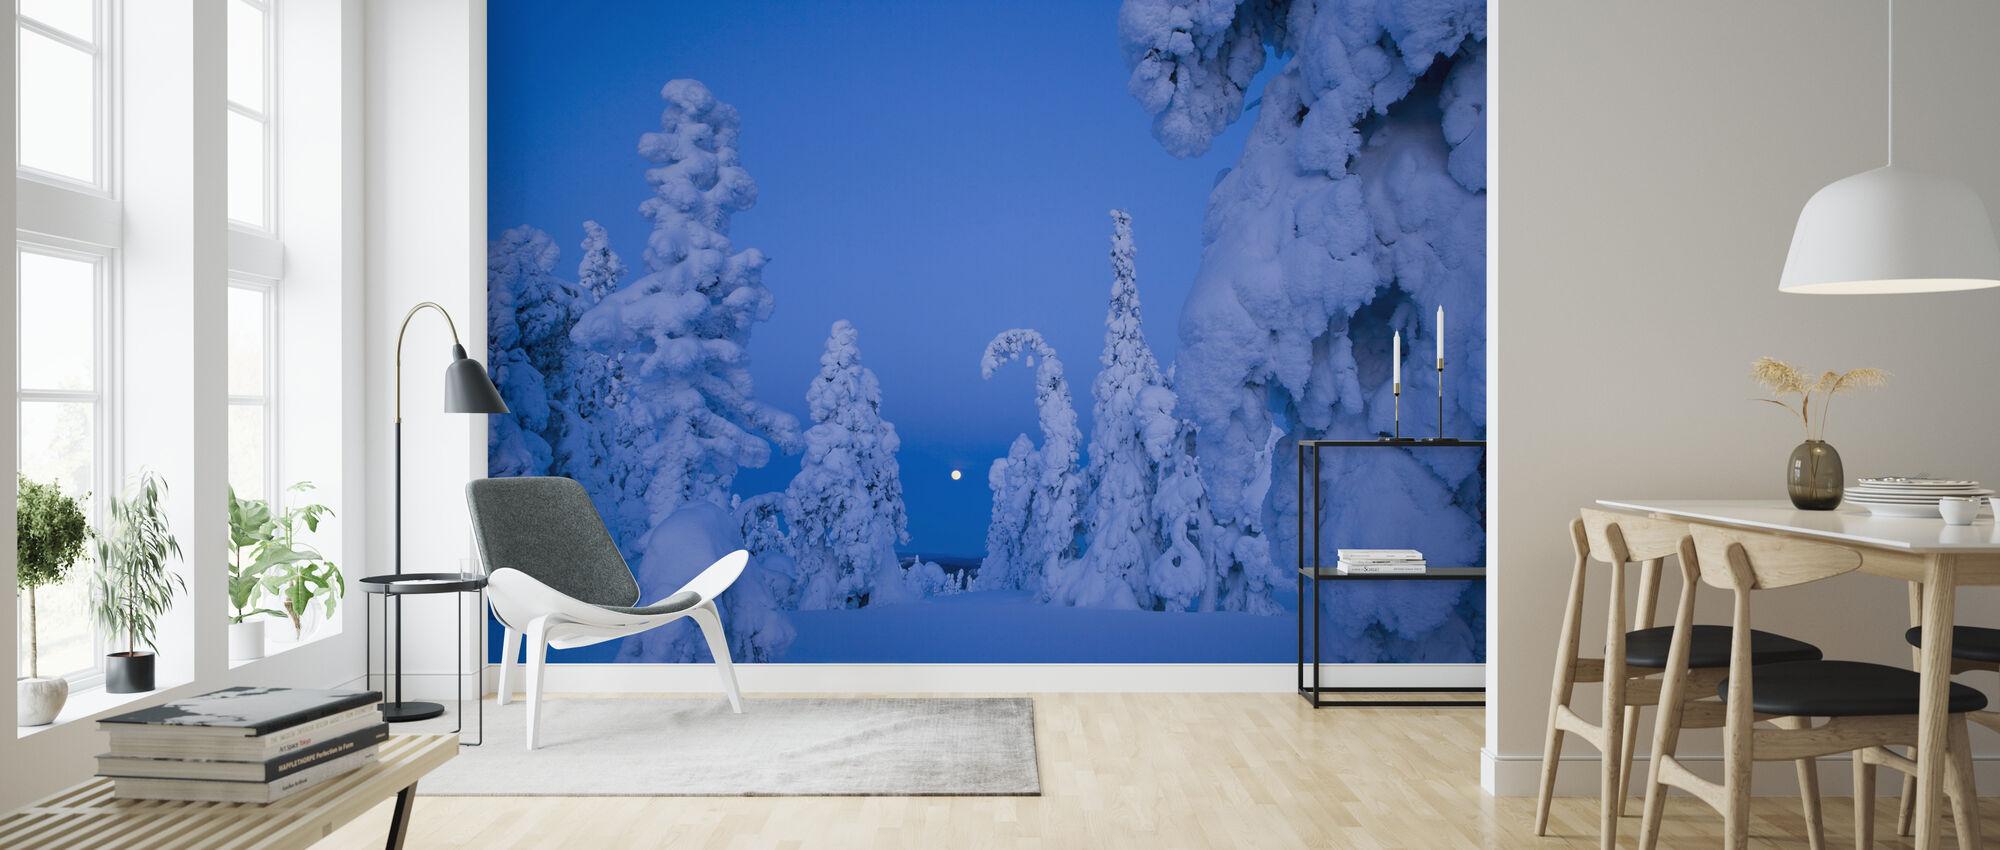 Sneeuw beladen Taiga Bos - Behang - Woonkamer